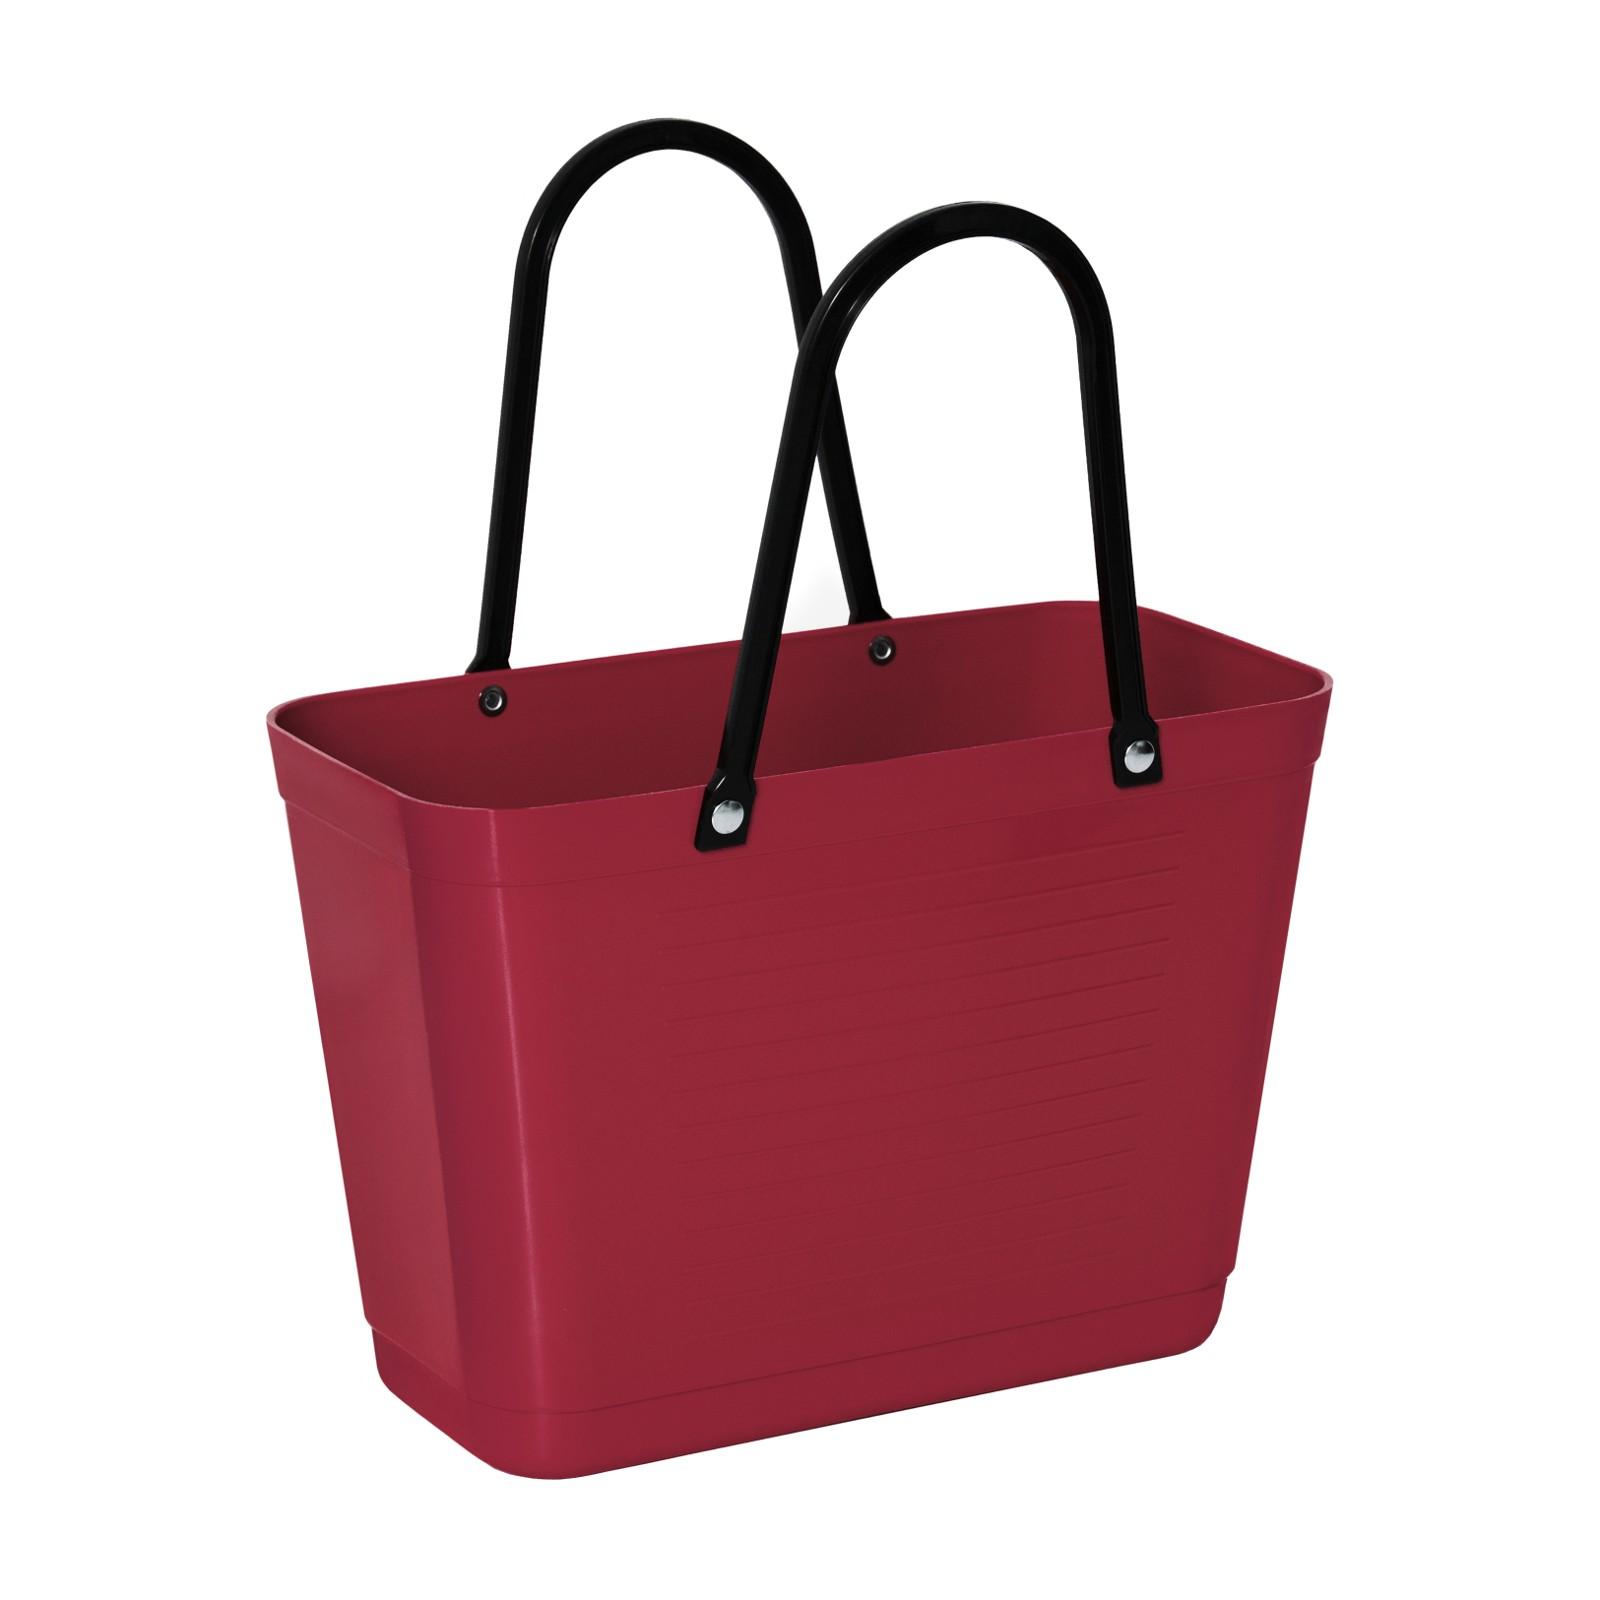 hinza 257-hinza-bag-small-maroon-green-plastic